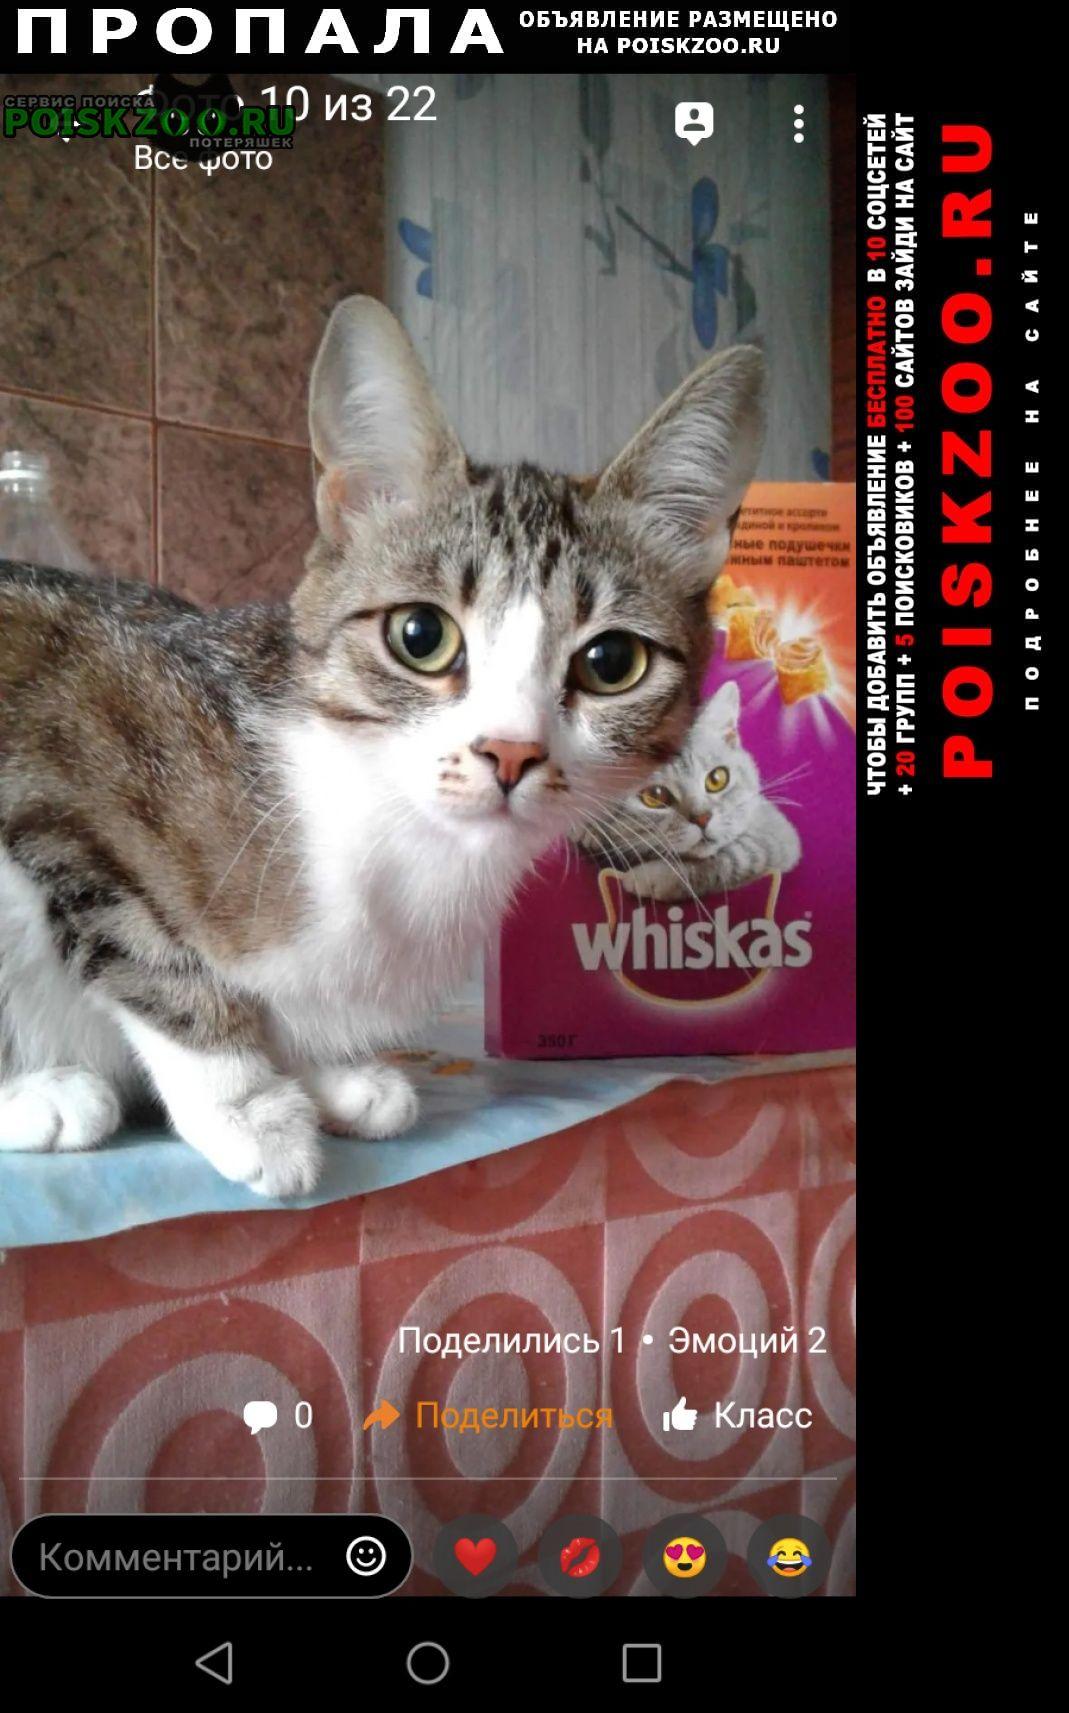 Пропала кошка рыся, найдись г.Иркутск